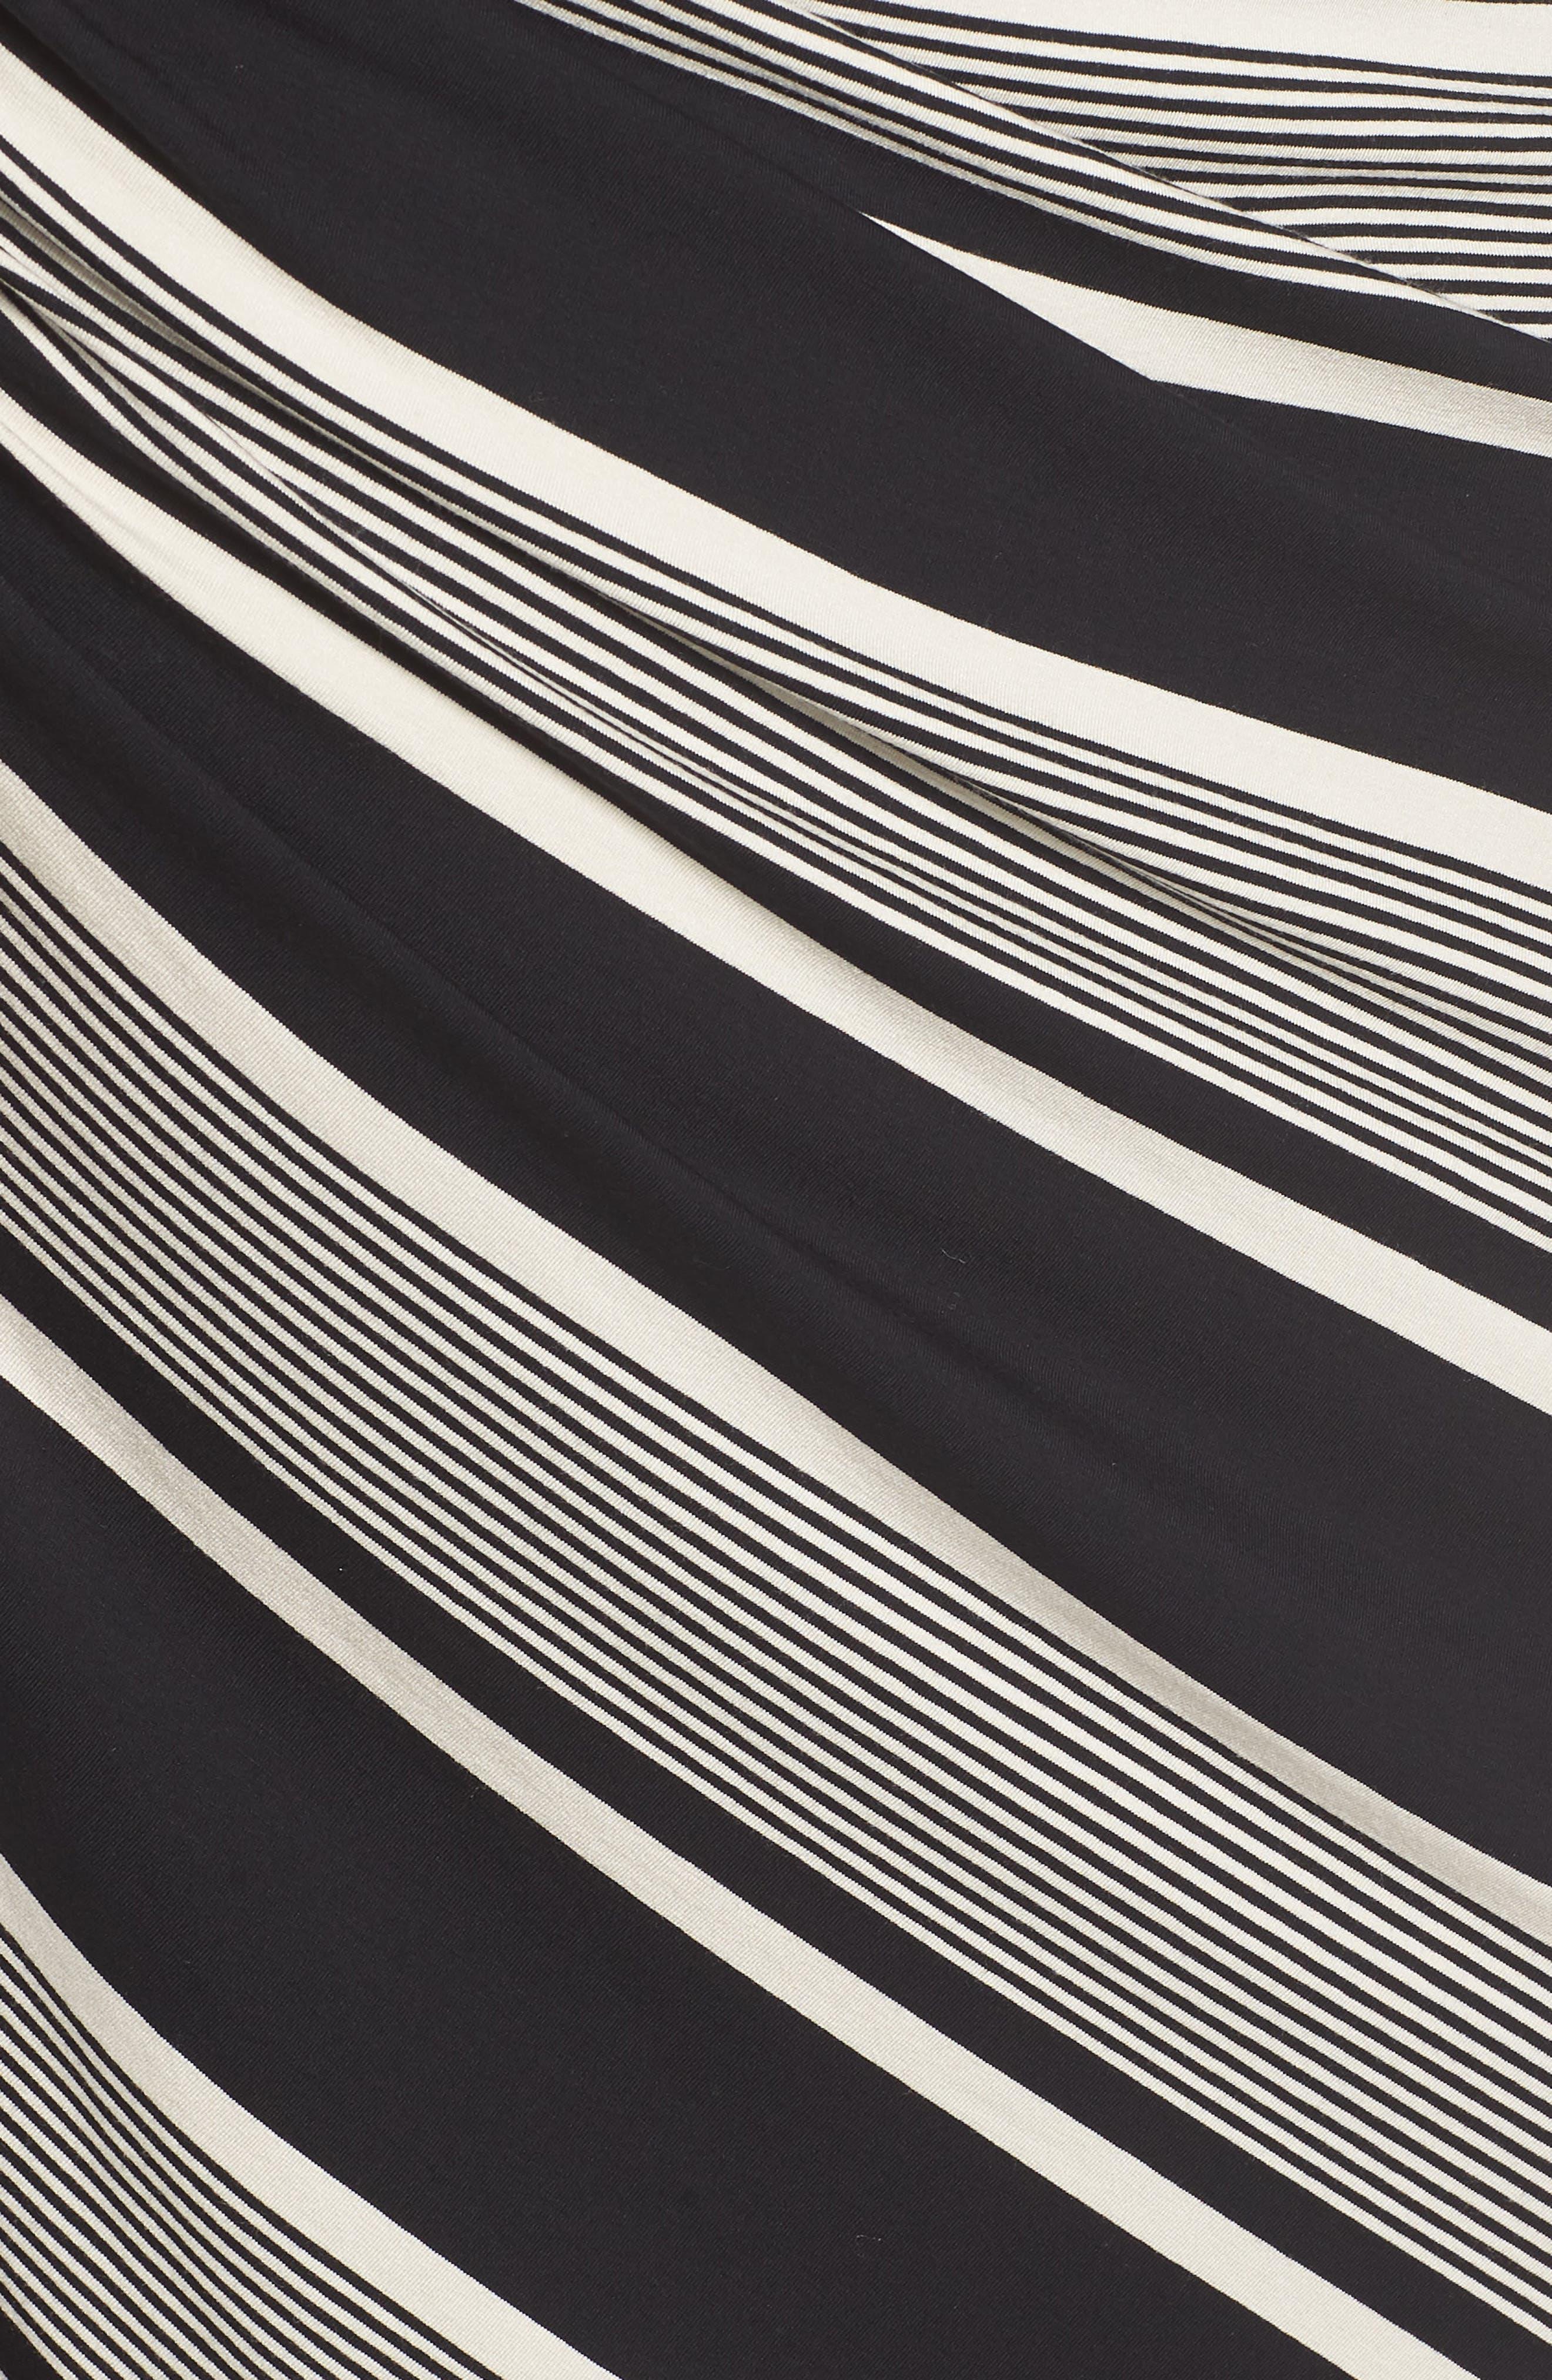 Venue Block Stripe Ruched Body-Con Dress,                             Alternate thumbnail 6, color,                             RICH BLACK